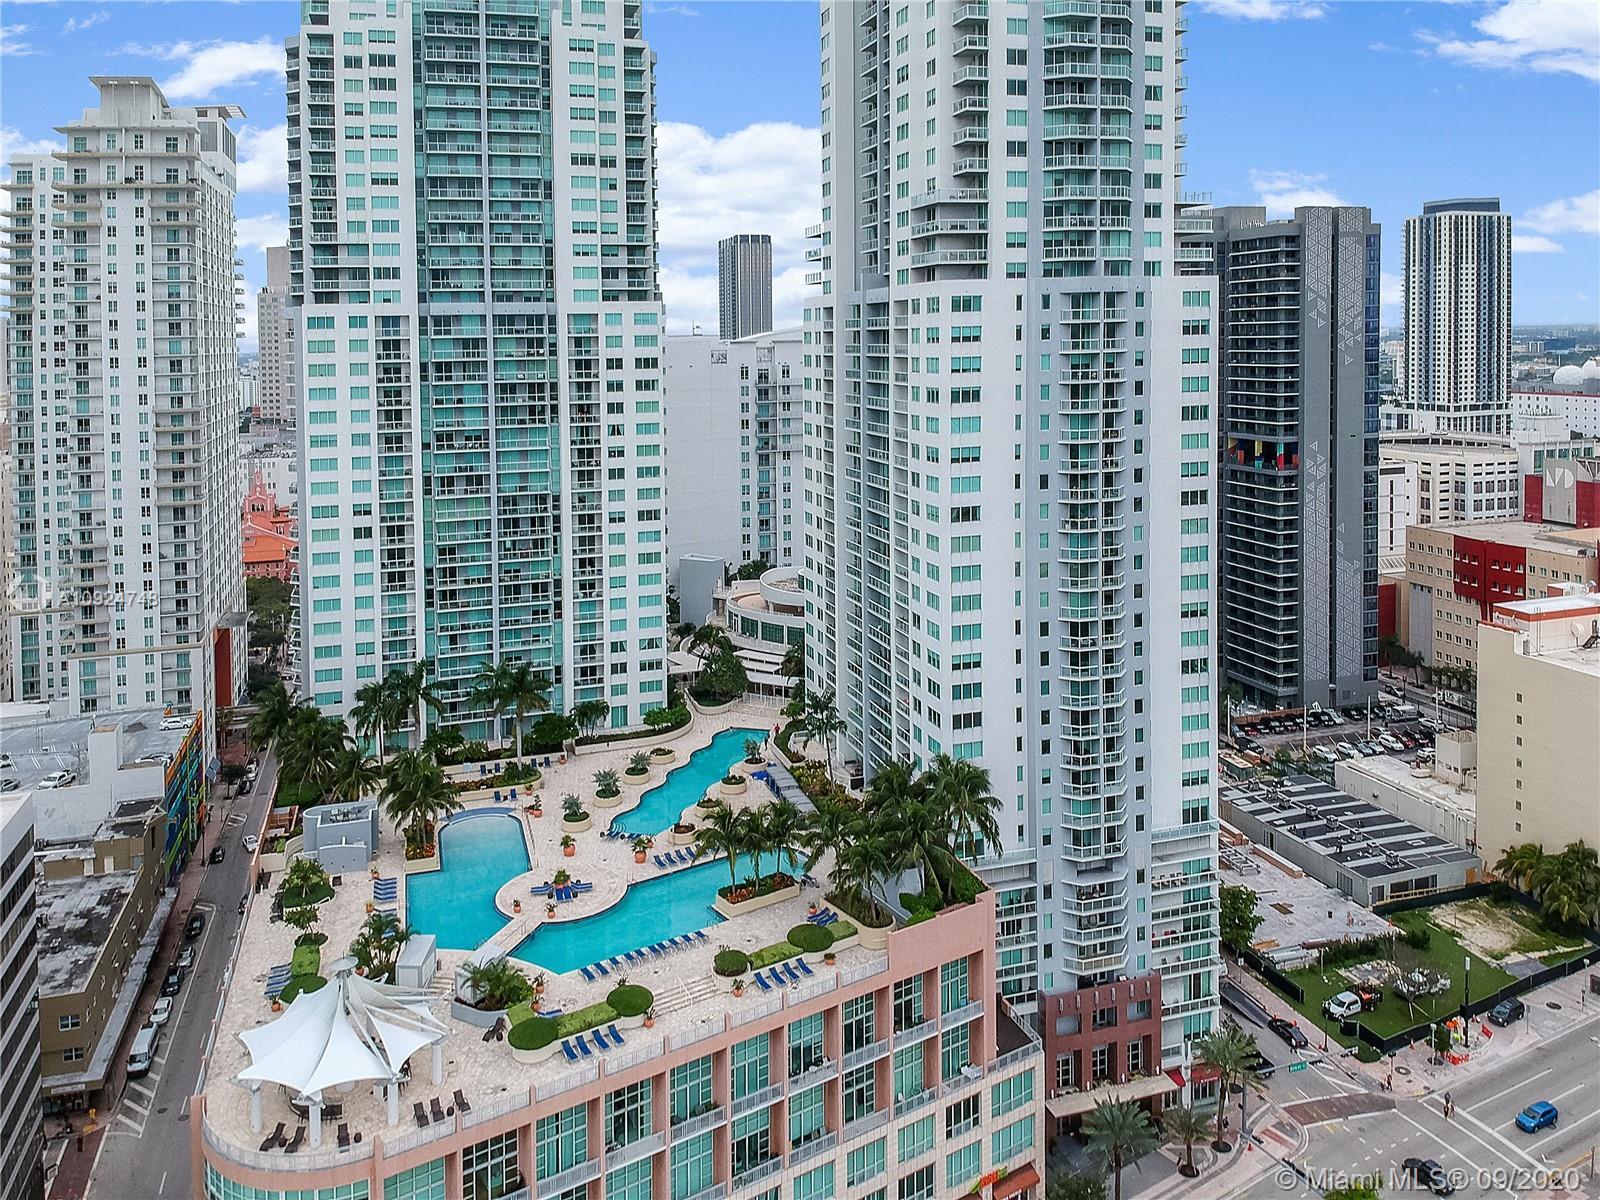 Vizcayne One #2403 - 244 Biscayne Blvd #2403, Miami, FL 33132